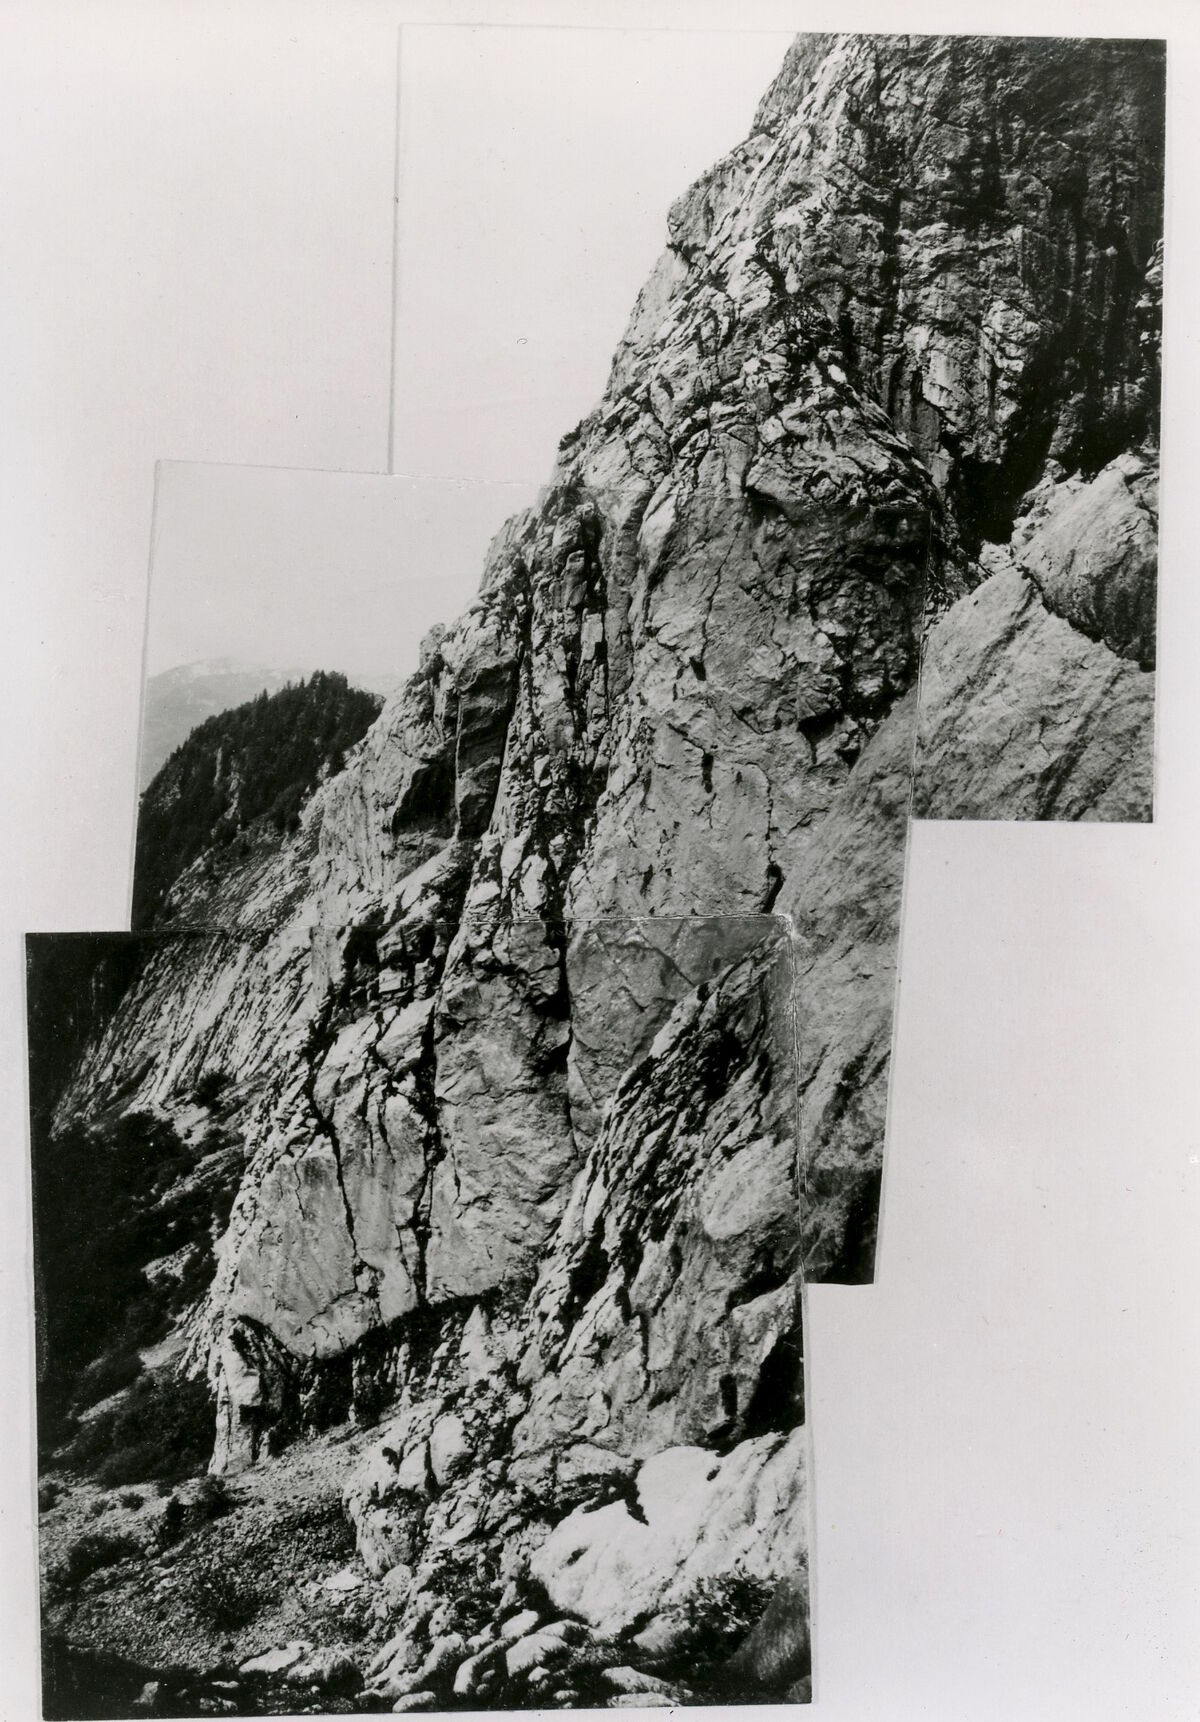 EBA 2/321.15: Landscape shot of Gonzen (Collage)